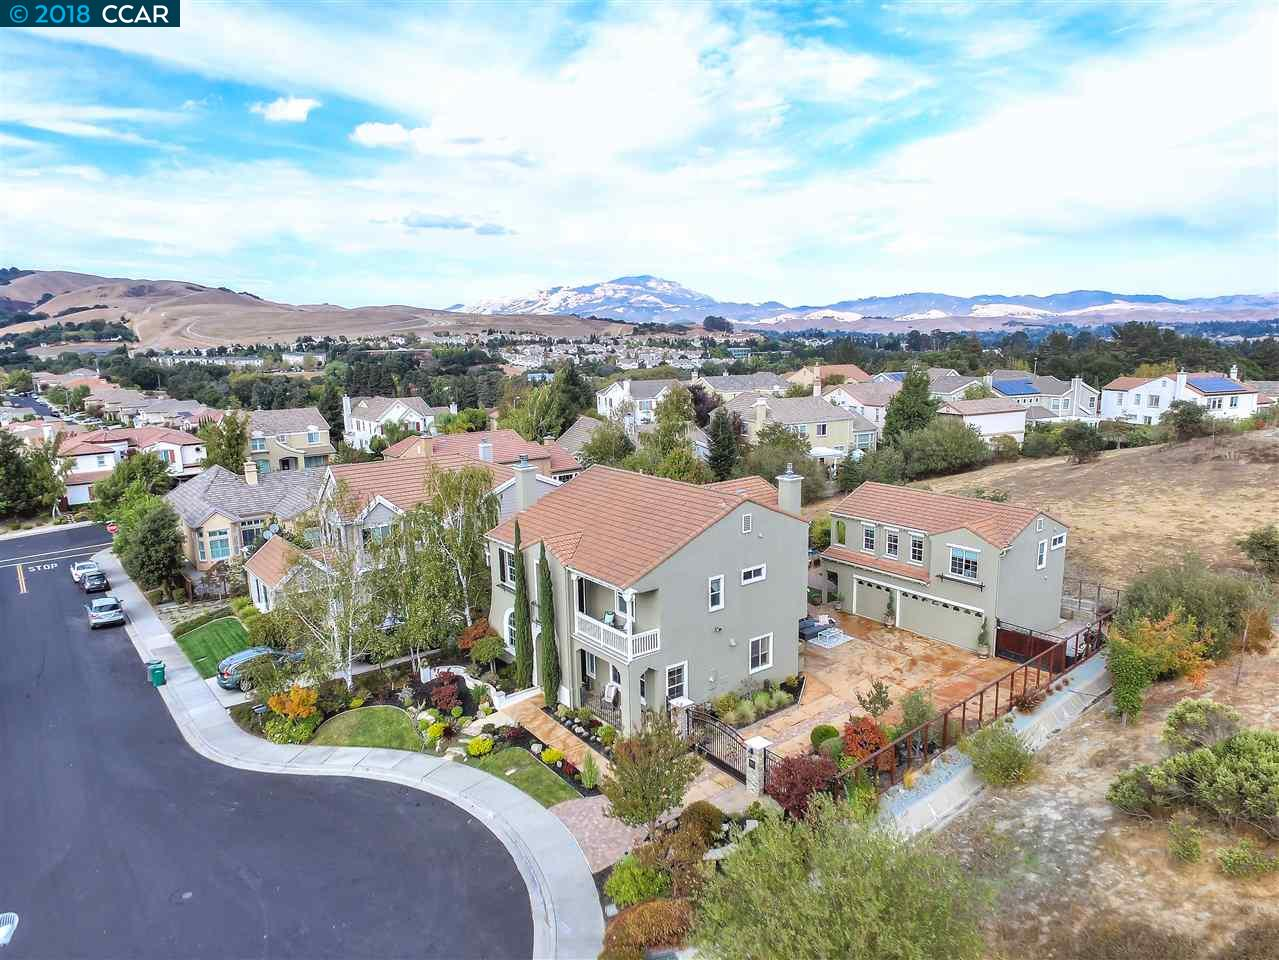 307 Vallado Ct San Ramon, CA 94583 - MLS #: 40841117